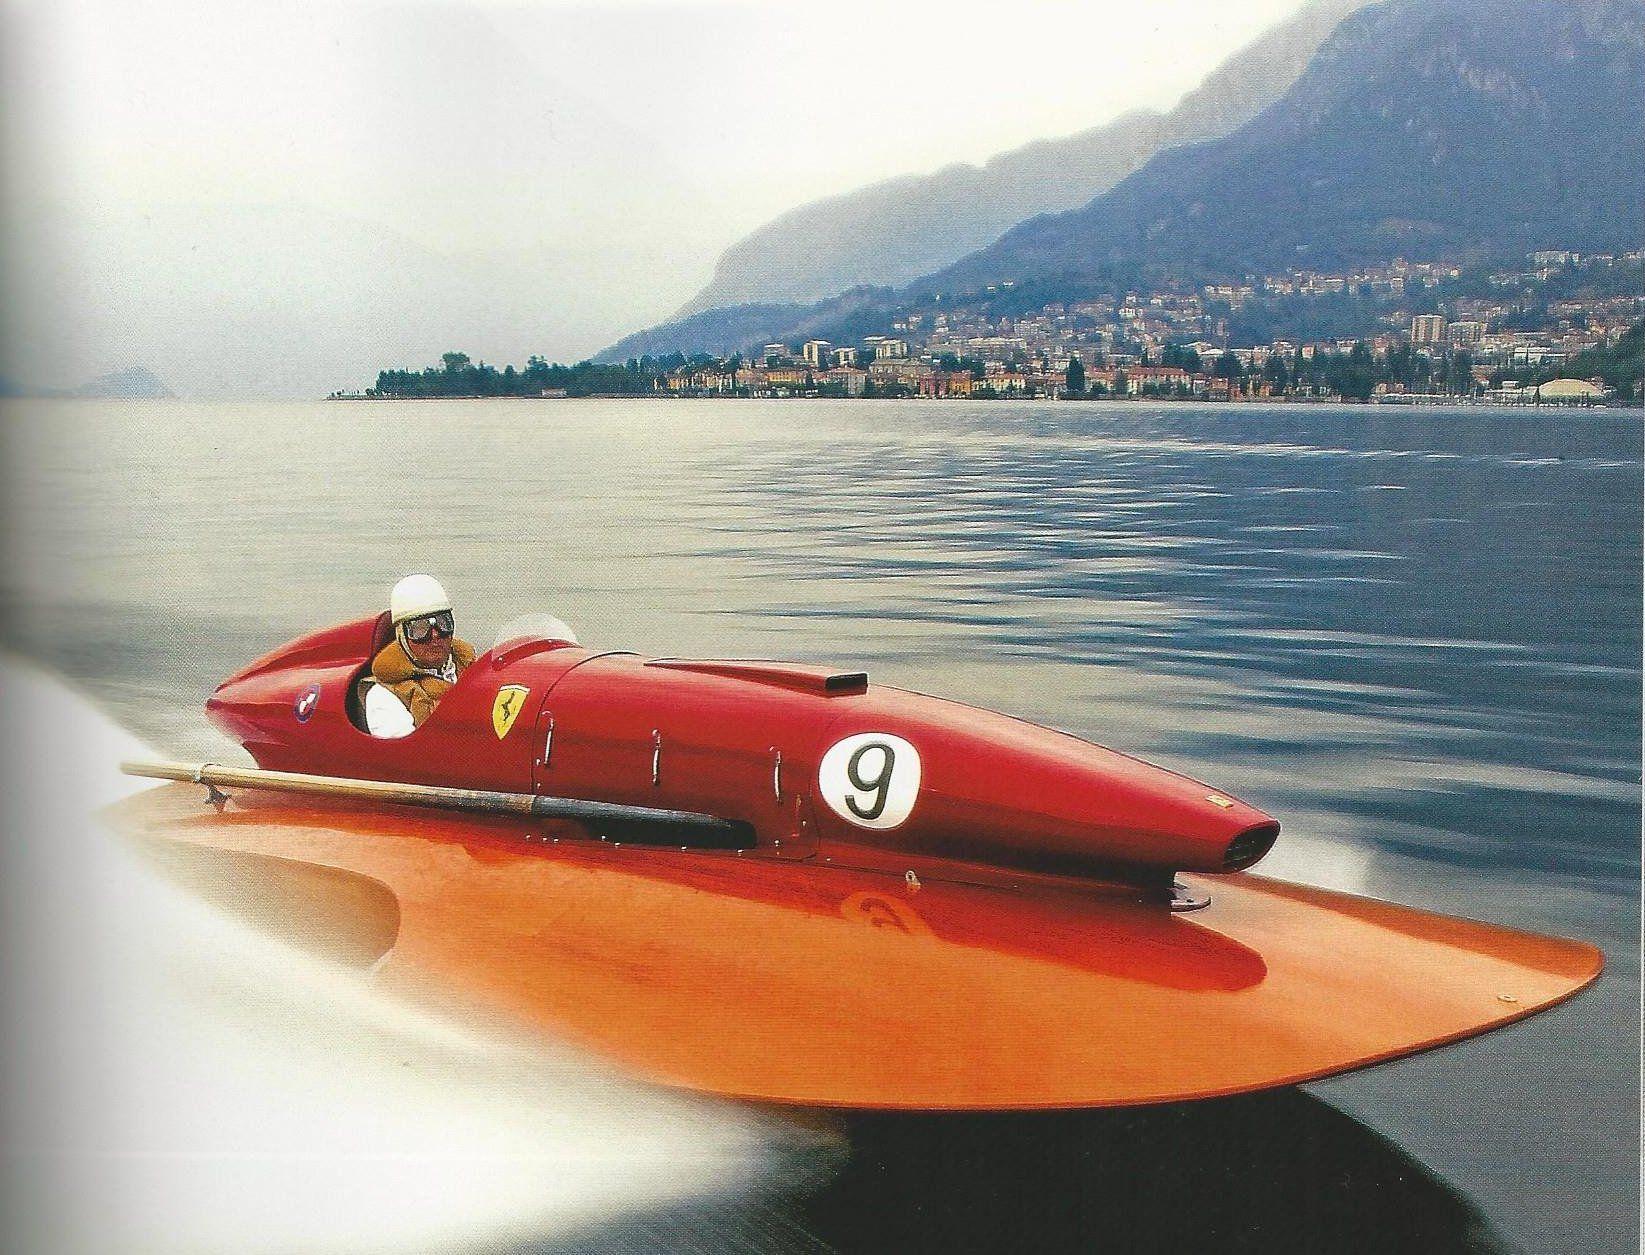 A Ferrari Speed Boat Speed Boats Ferrari Boat Drag Boat Racing